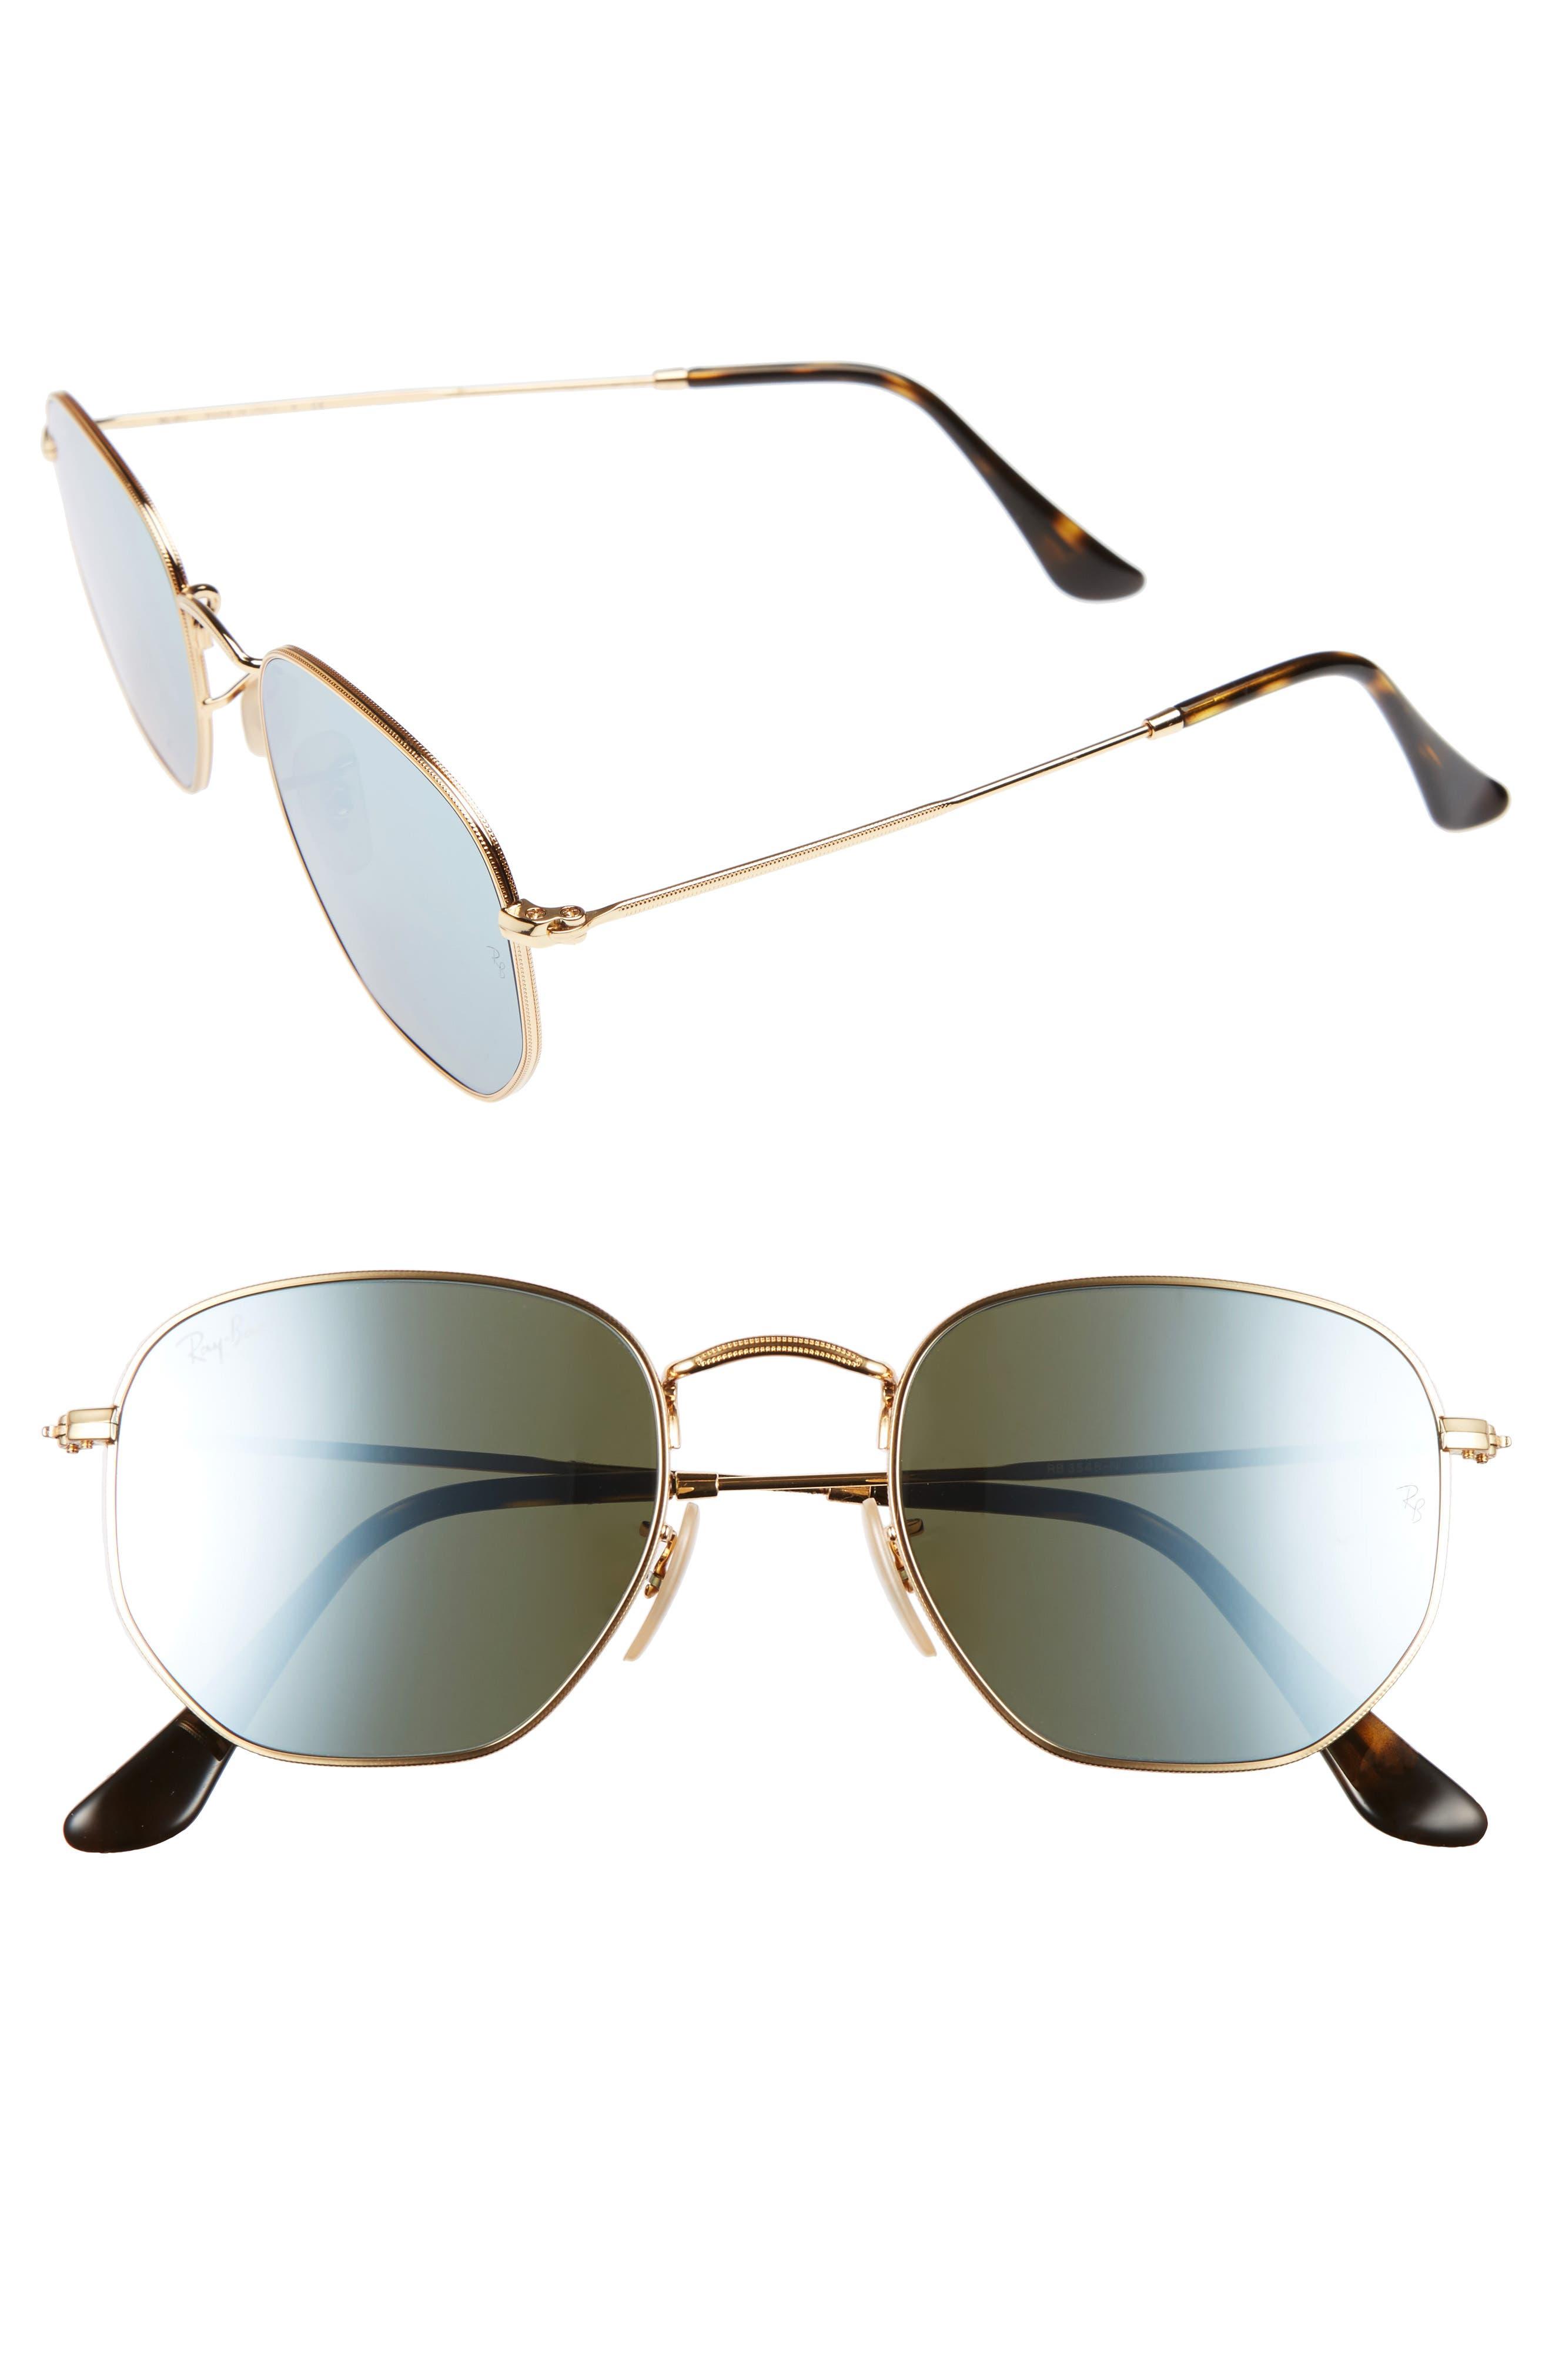 51mm Sunglasses,                         Main,                         color, 710